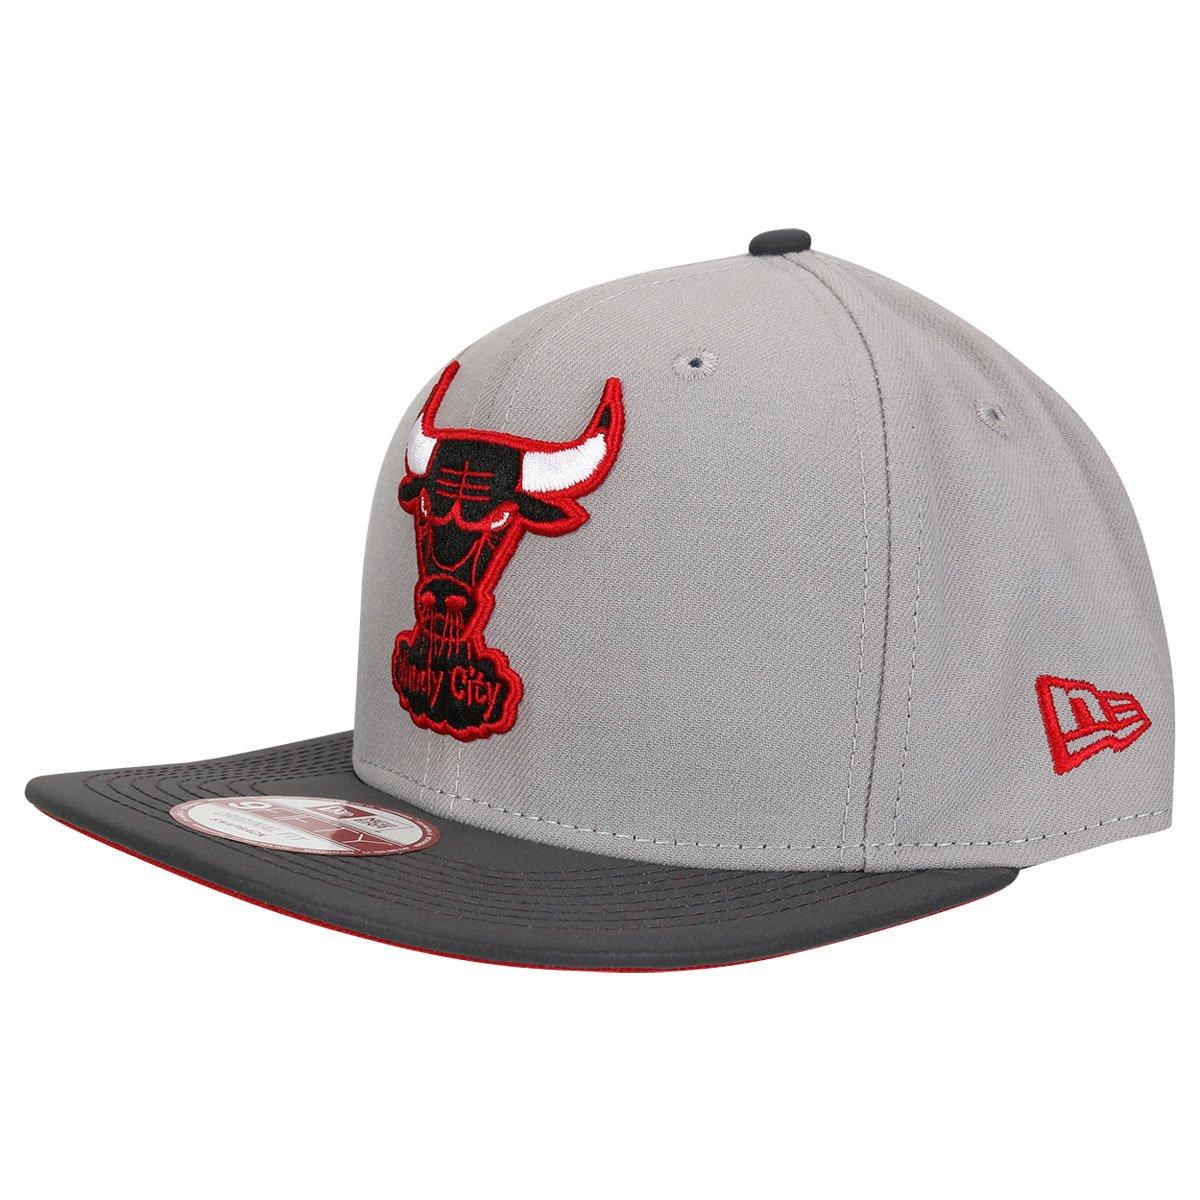 71e44936aa61a ... Kit NBA Camiseta Regata Adidas Swingman Chicago Bulls - Rose + Boné New  Era 950 Chicago ...